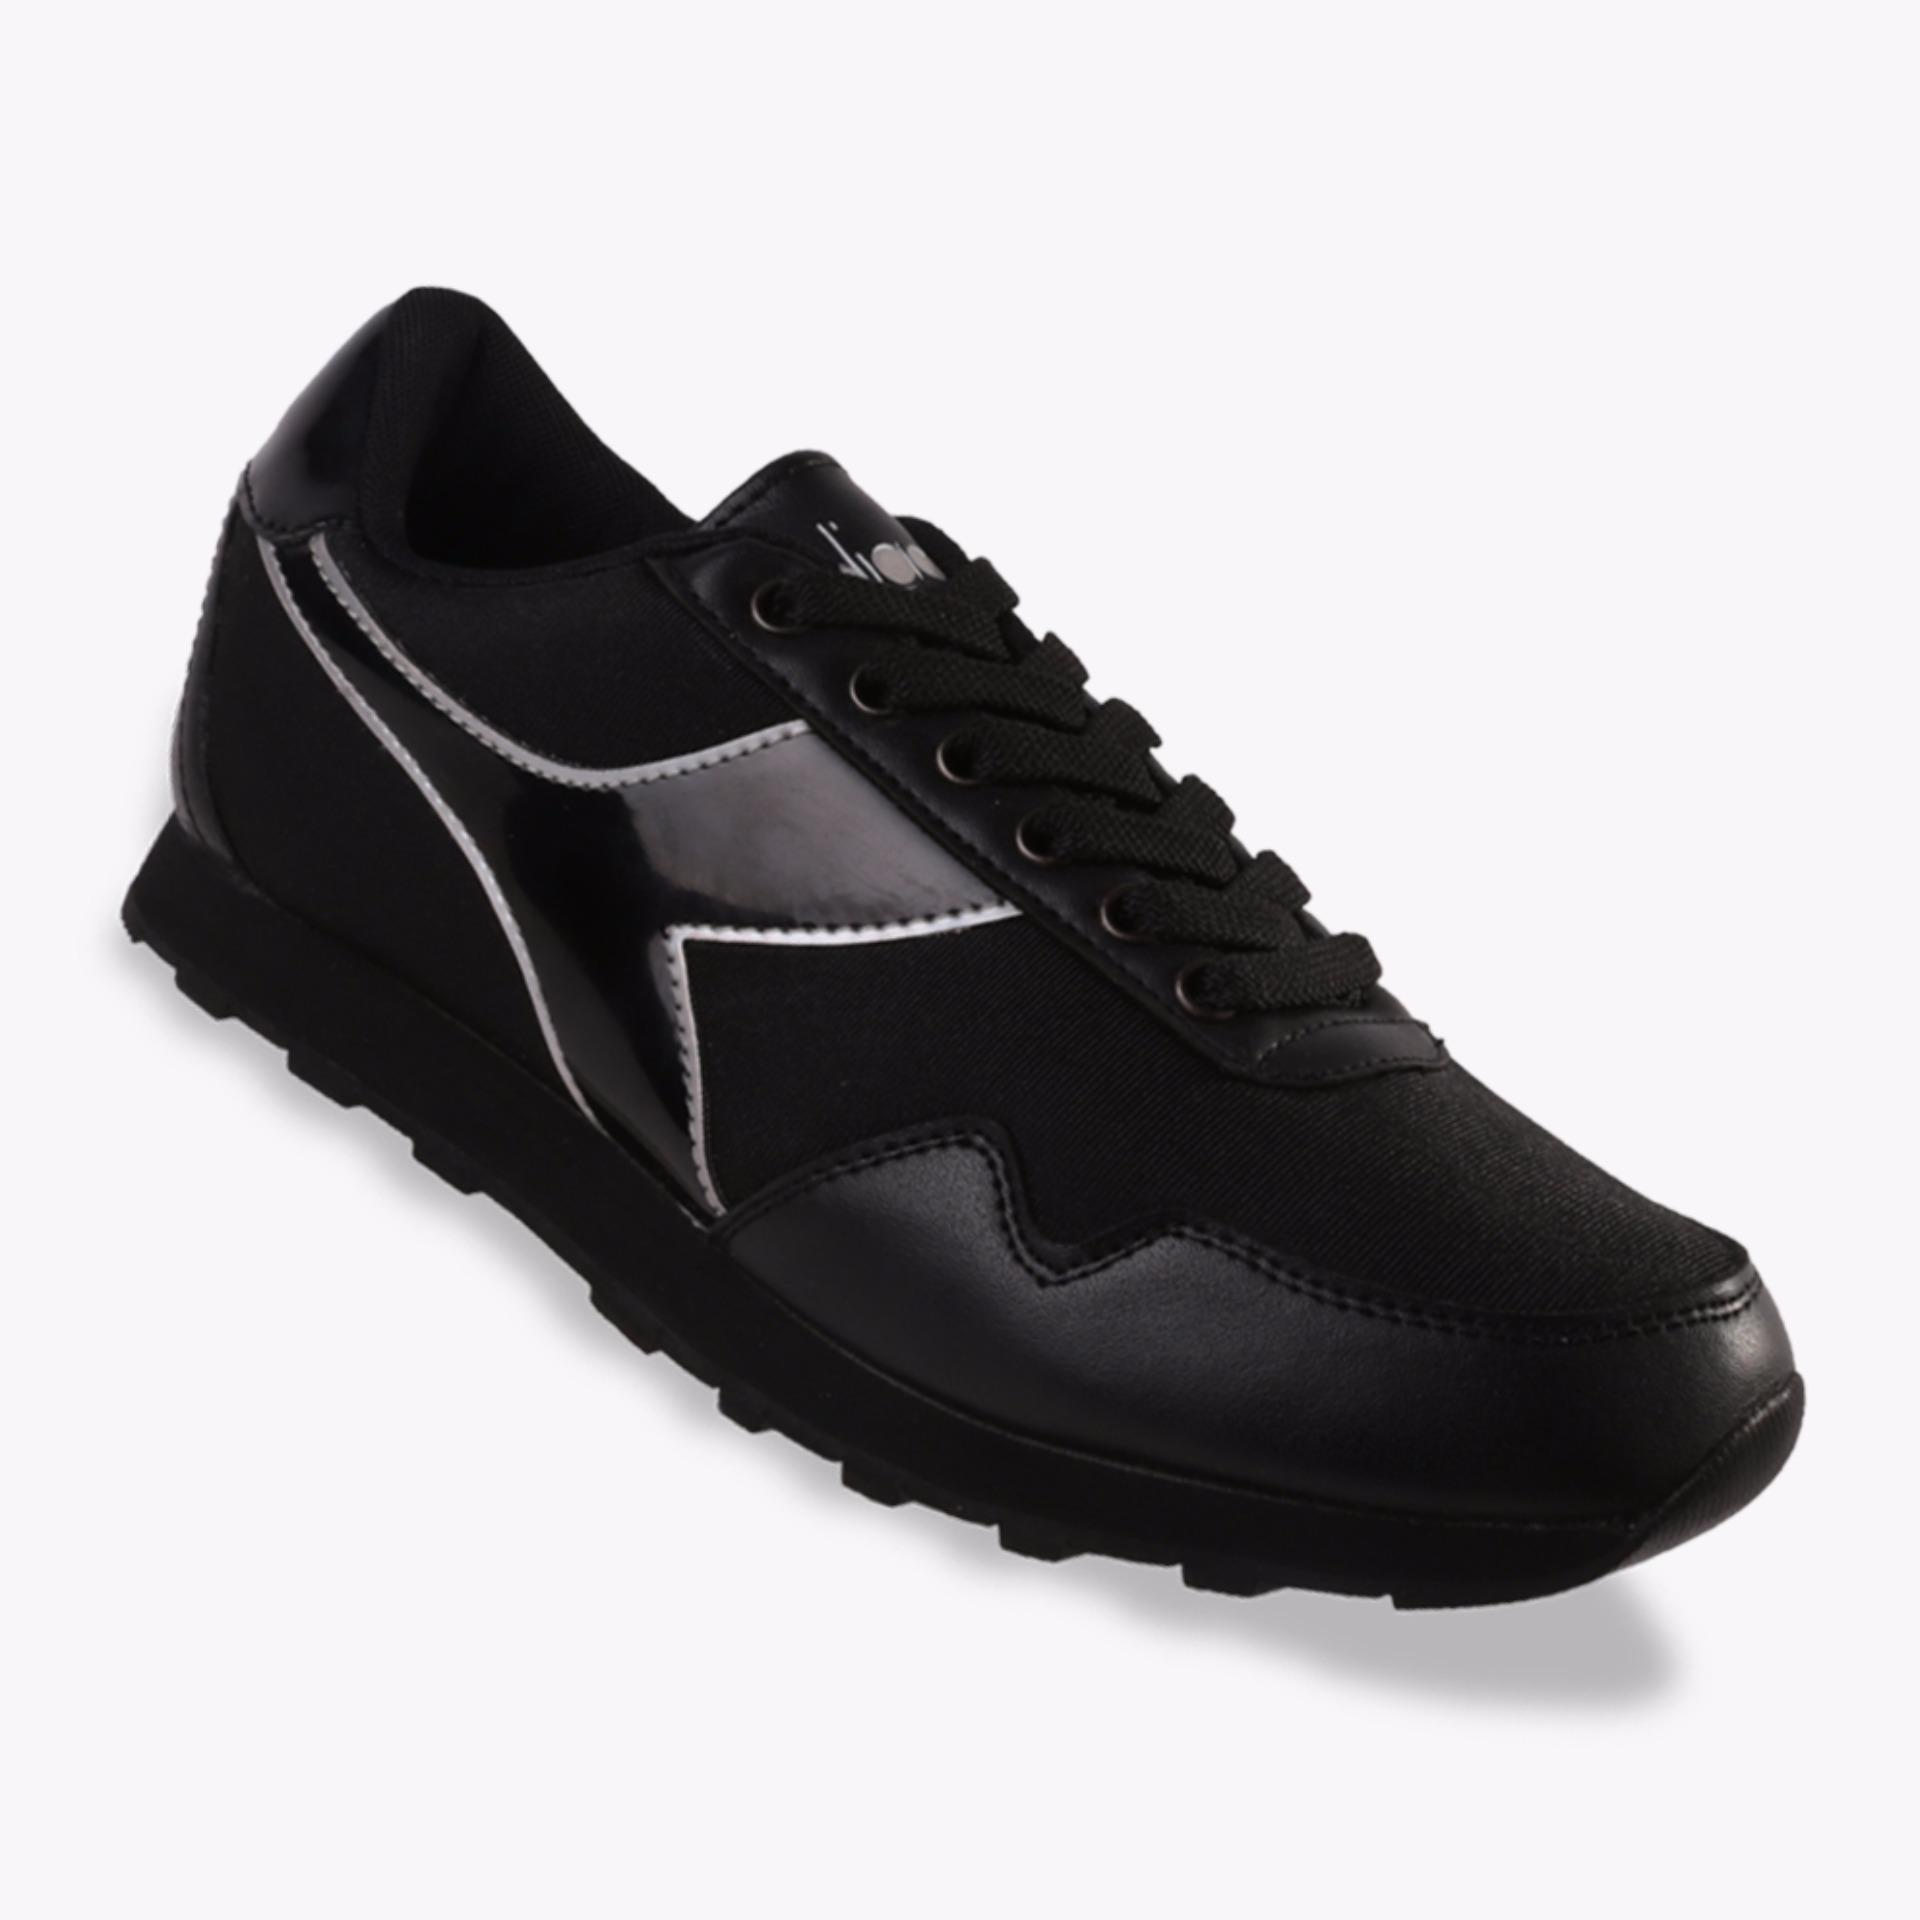 Toko Diadora Edita Women S Sneakers Shoes Hitam Online Di Indonesia